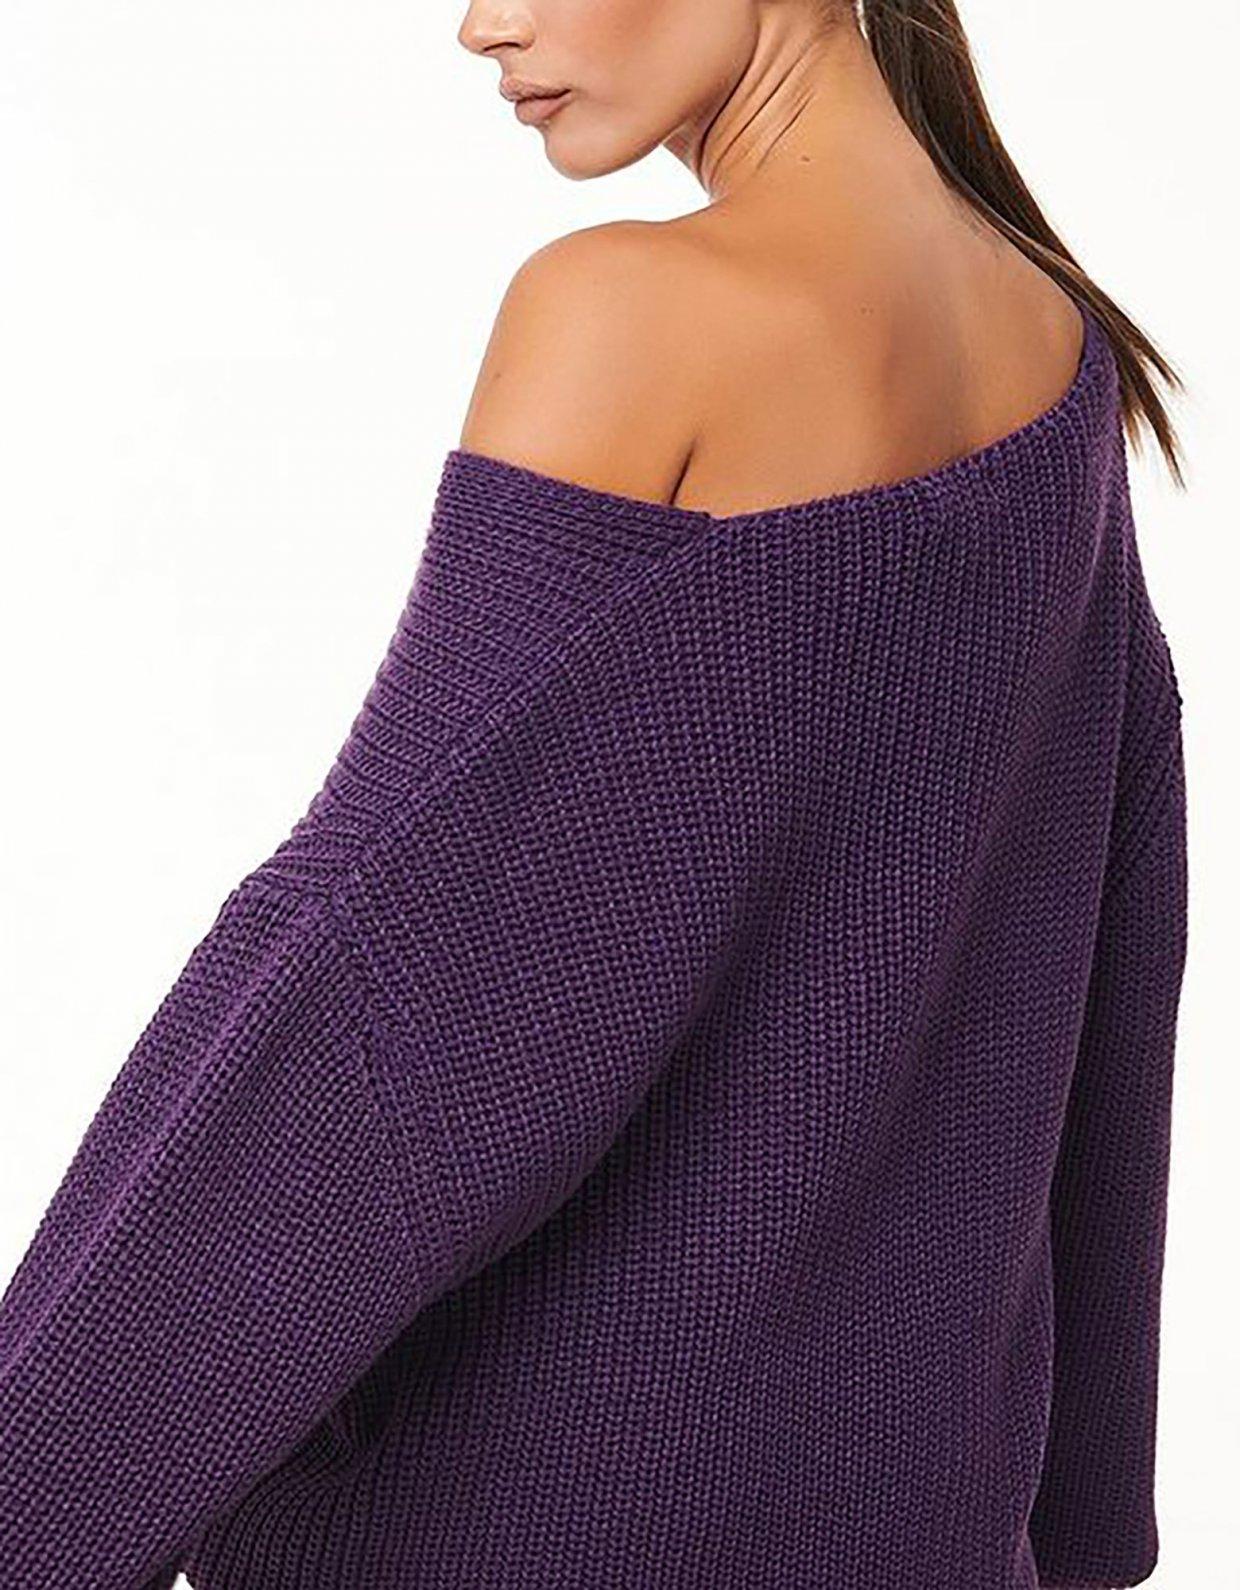 Combos Knitwear Combos W53Α – Purple loose top